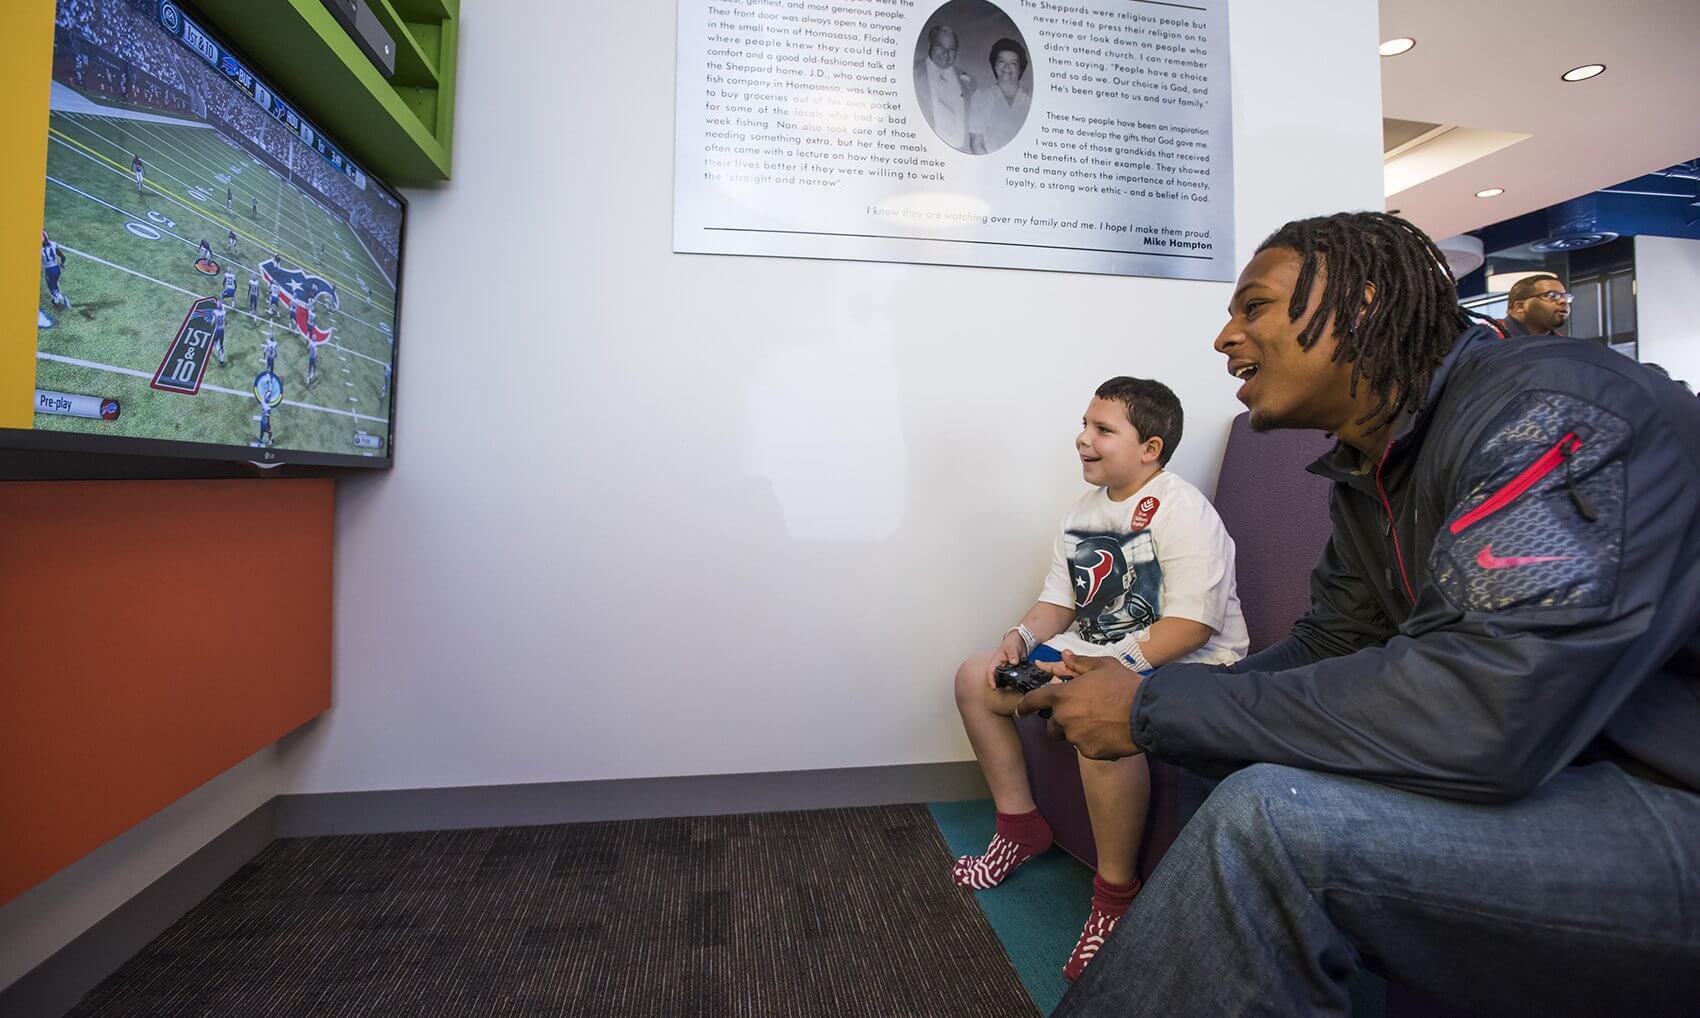 Safety Lonnie Ballentine plays a video game with Dylan Tindall. (Credit: Allen S. Kramer/Texas Children's Hospital)